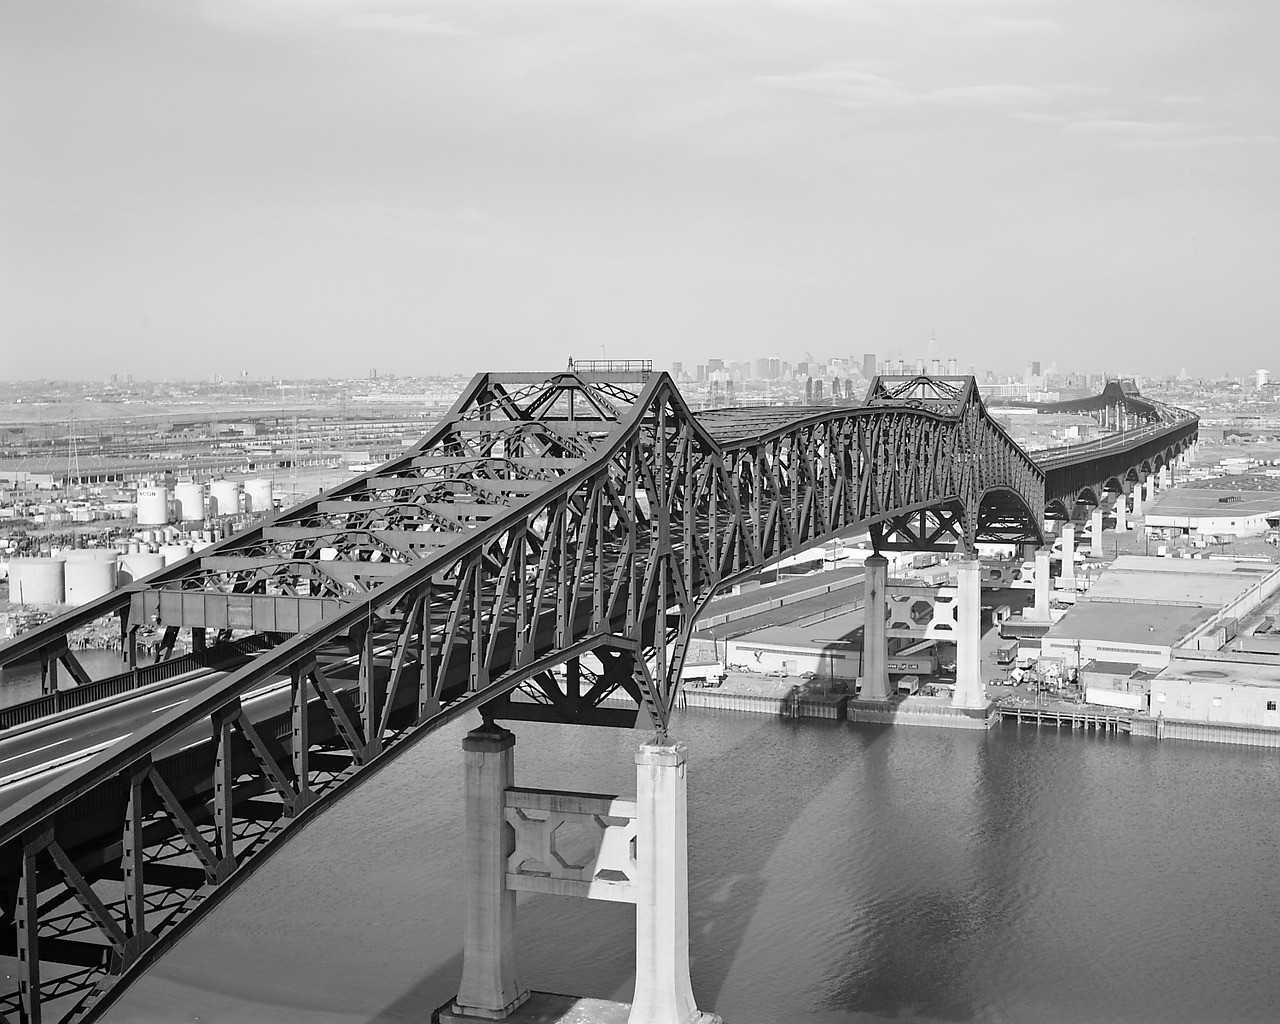 General Pulaski Skyway, black and white photo